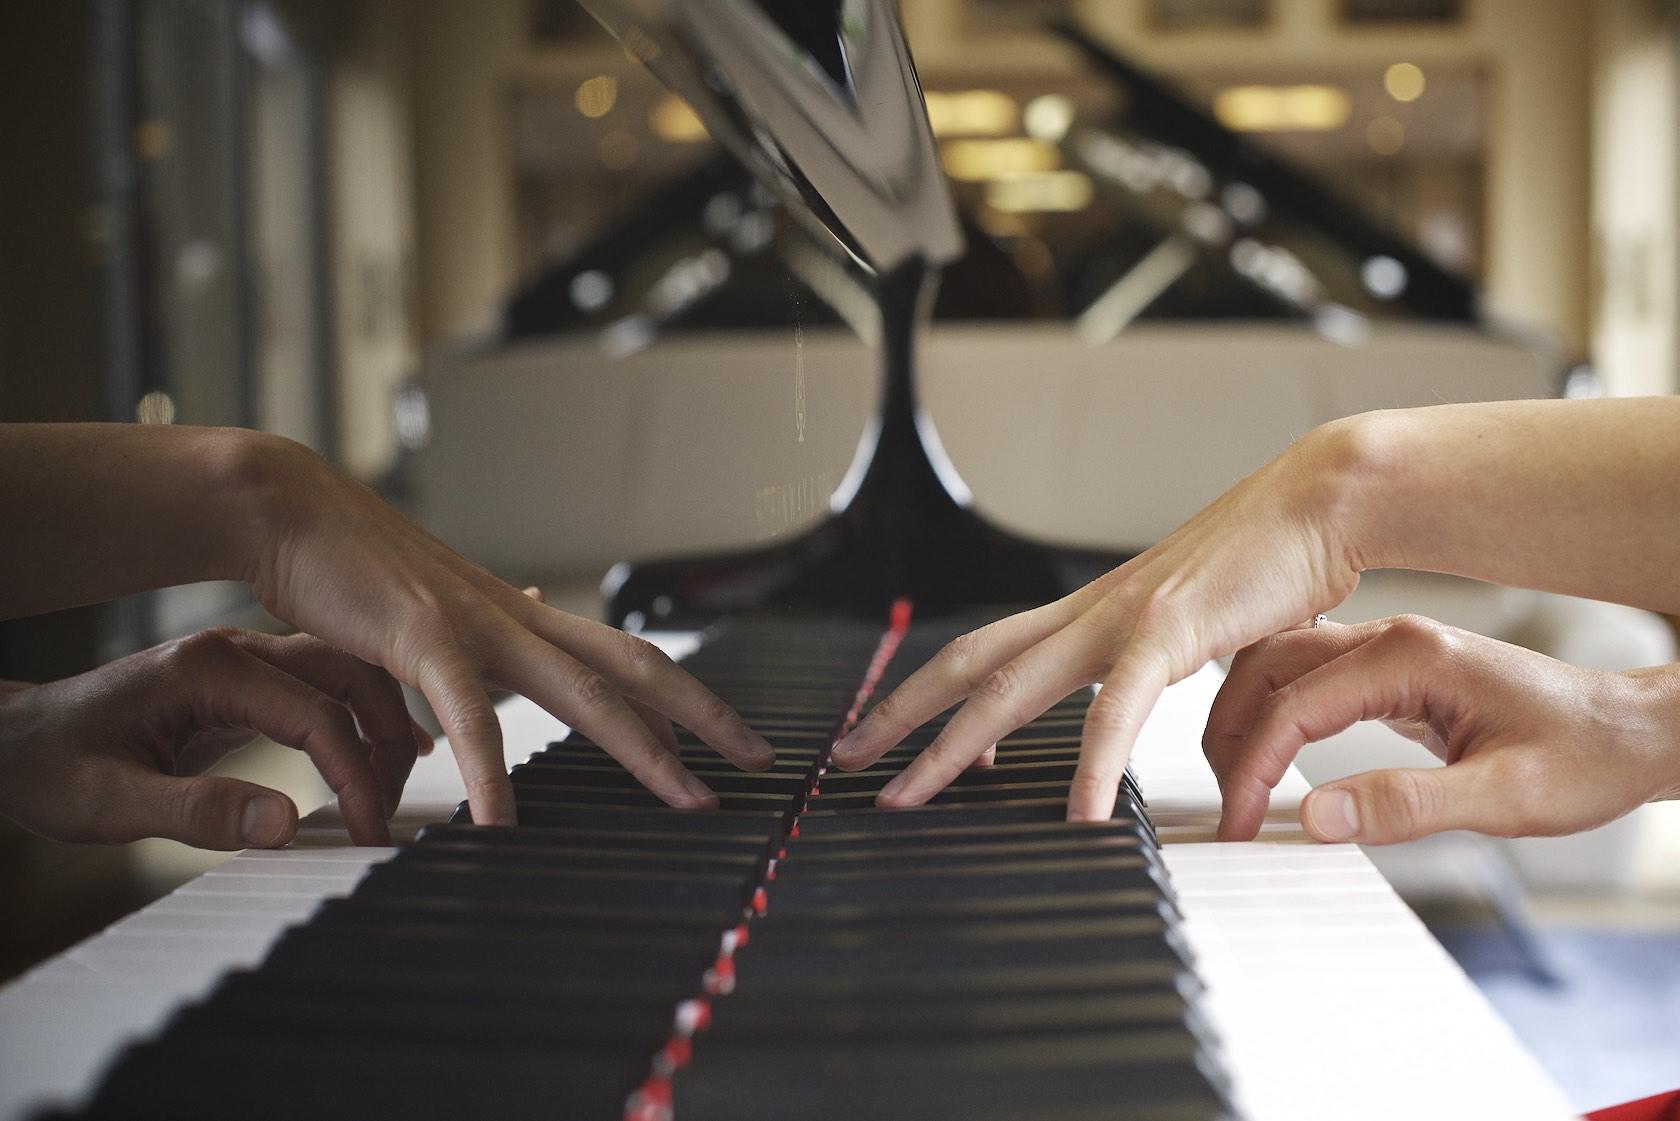 Aisa ljiri, Steinway Artist, playing piano. Photo: Lugermad